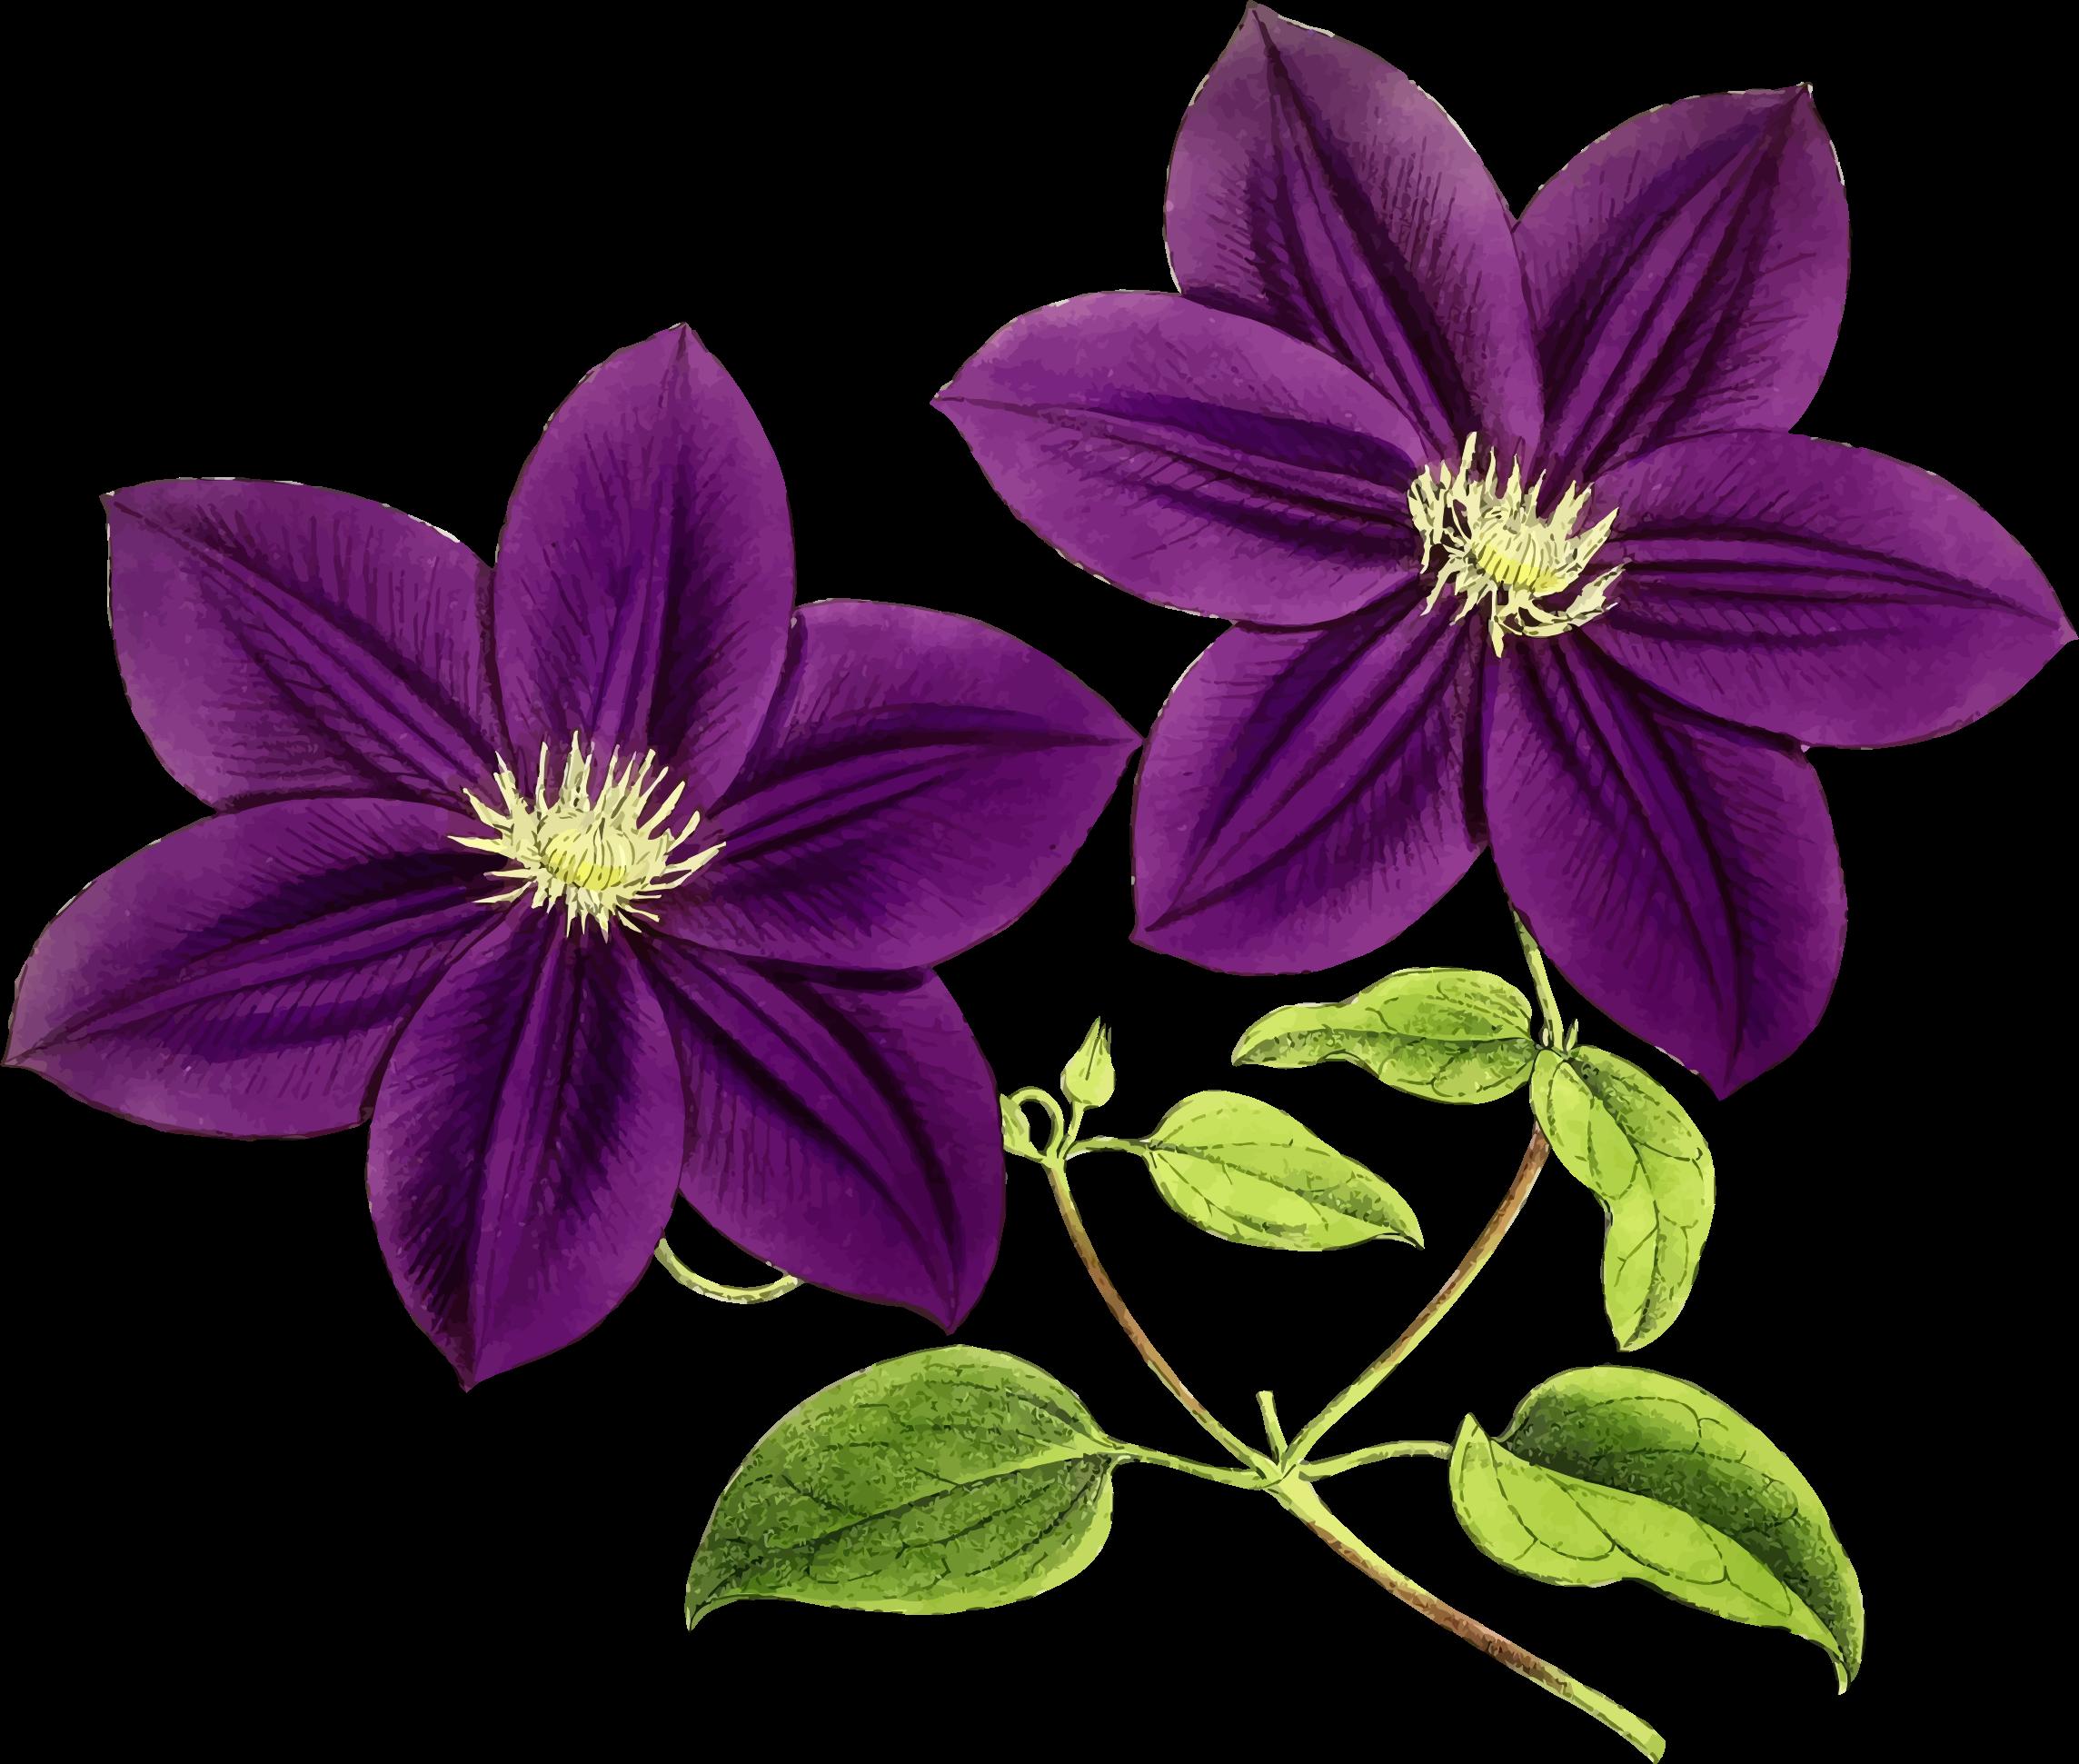 Big image png. Clipart flowers purple